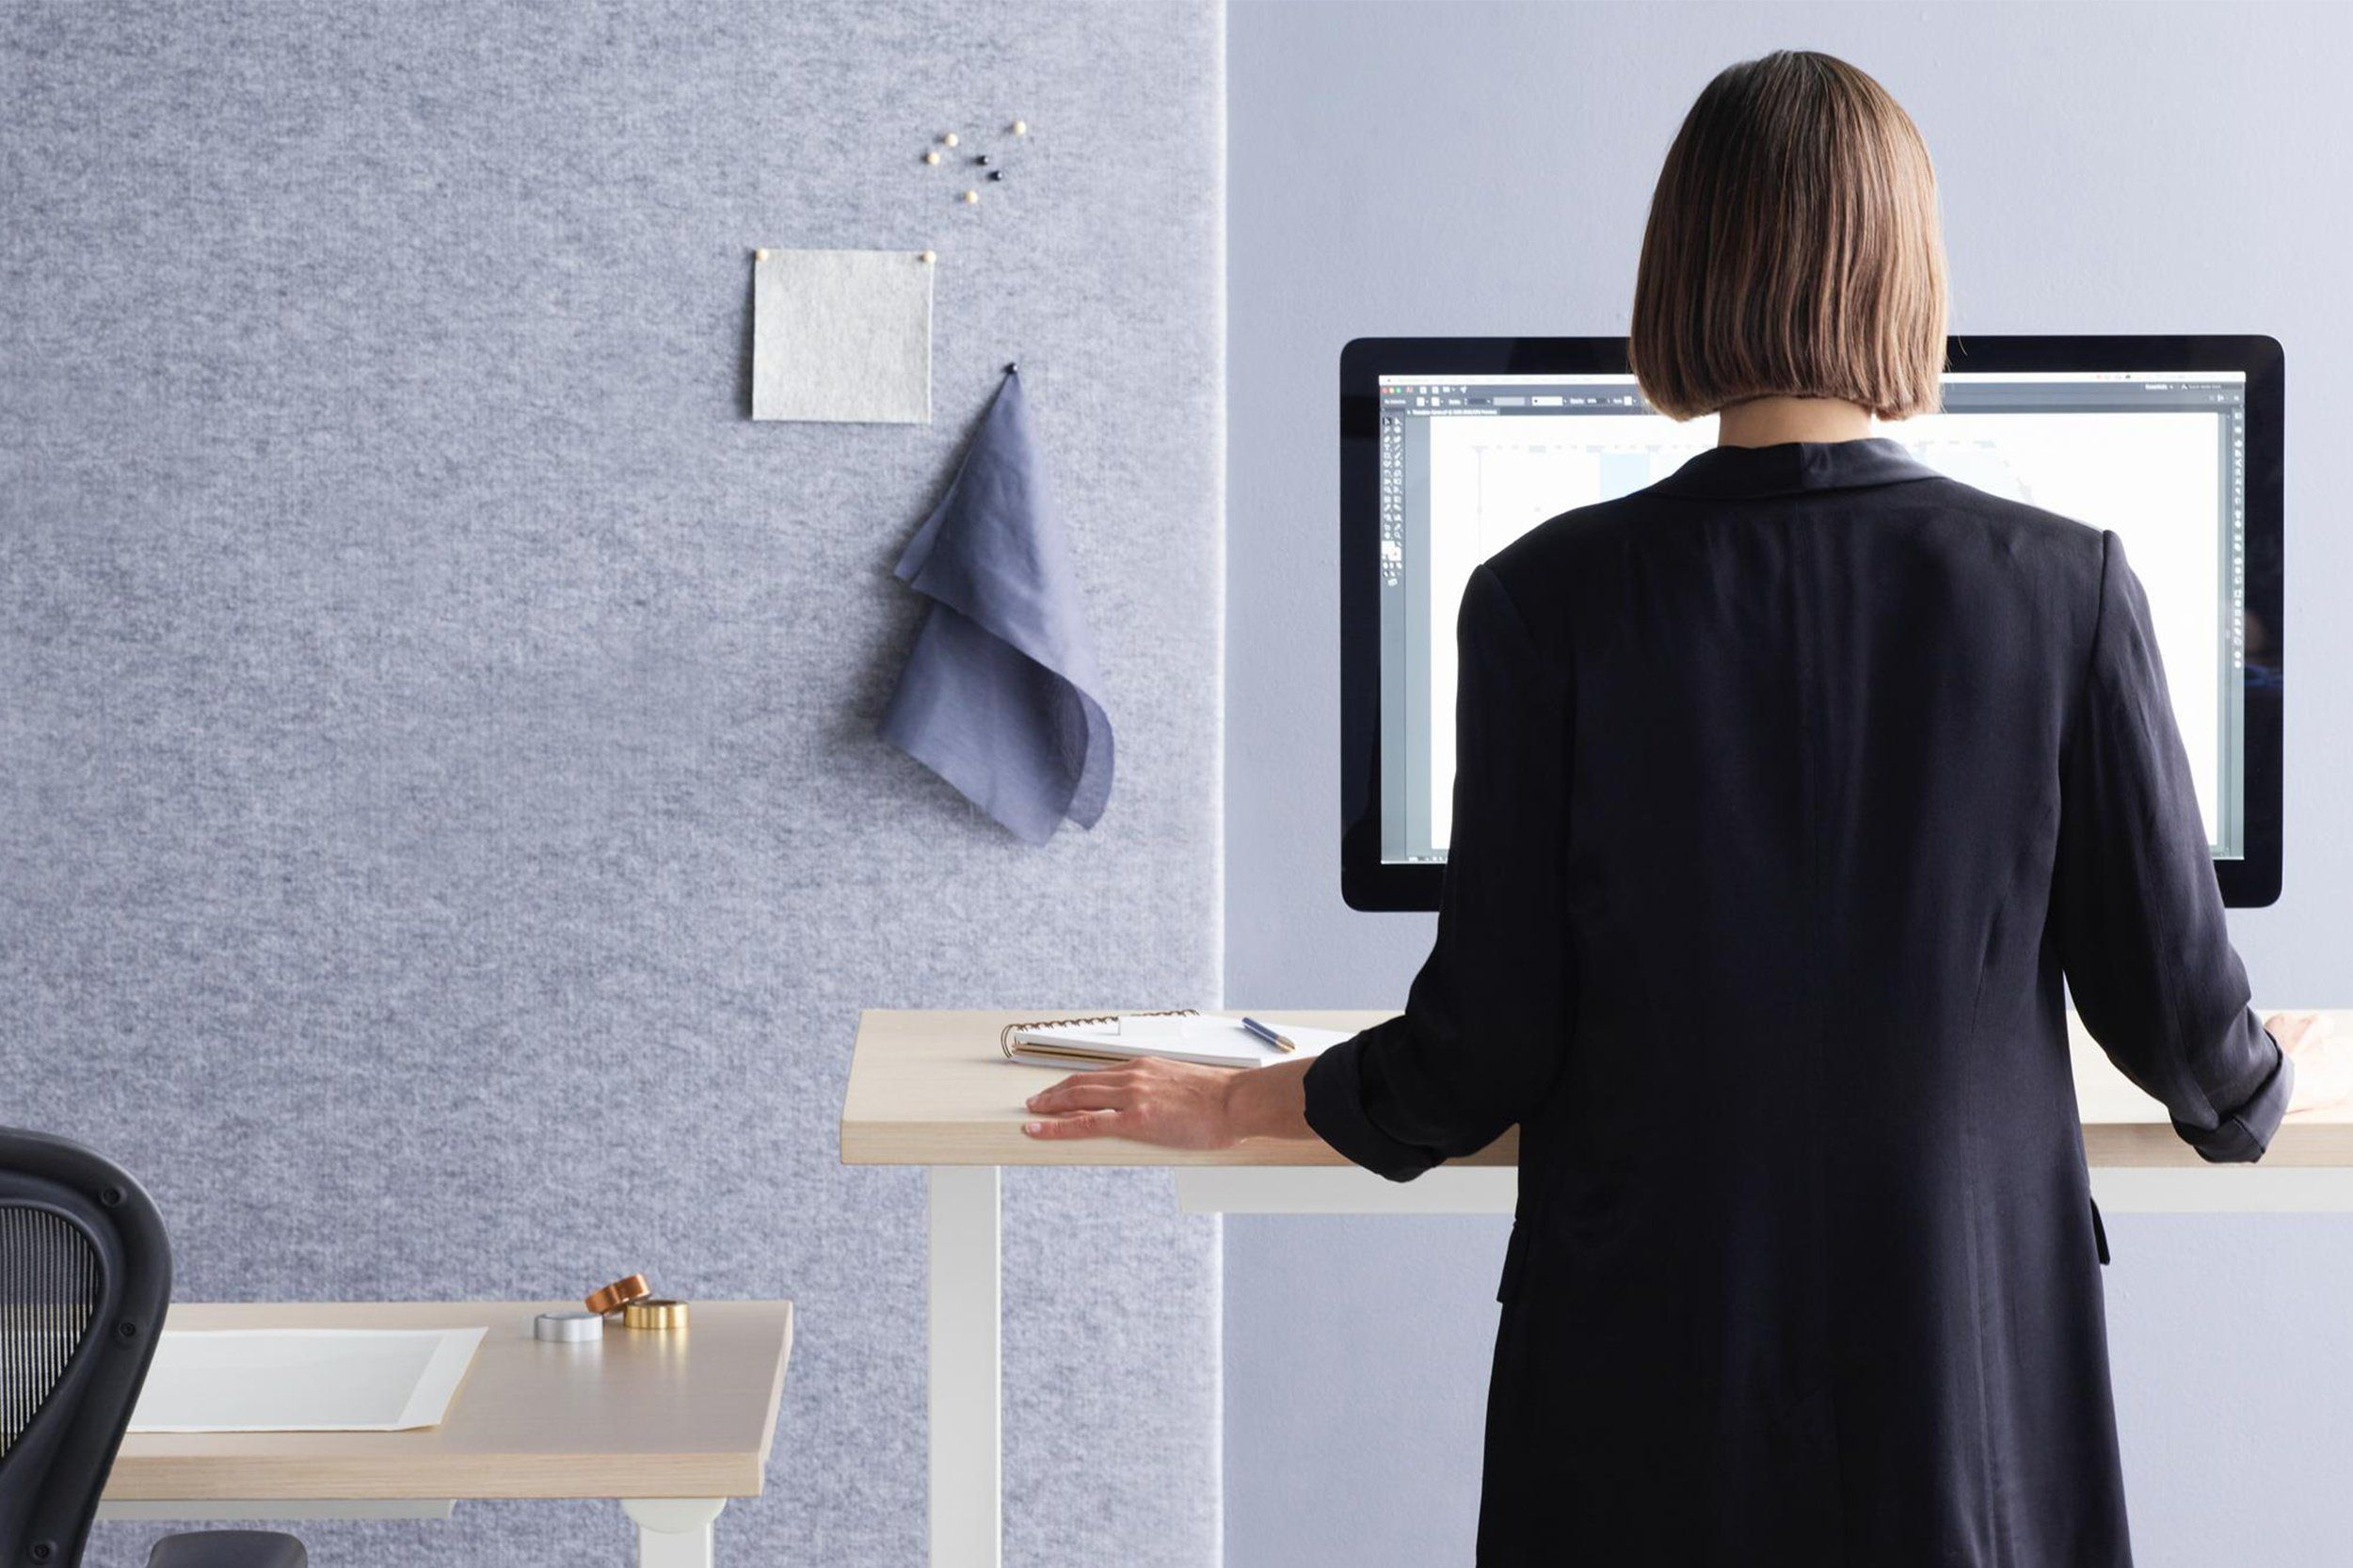 Live Os Where Robotics Meets Office Design Smart Desk Best